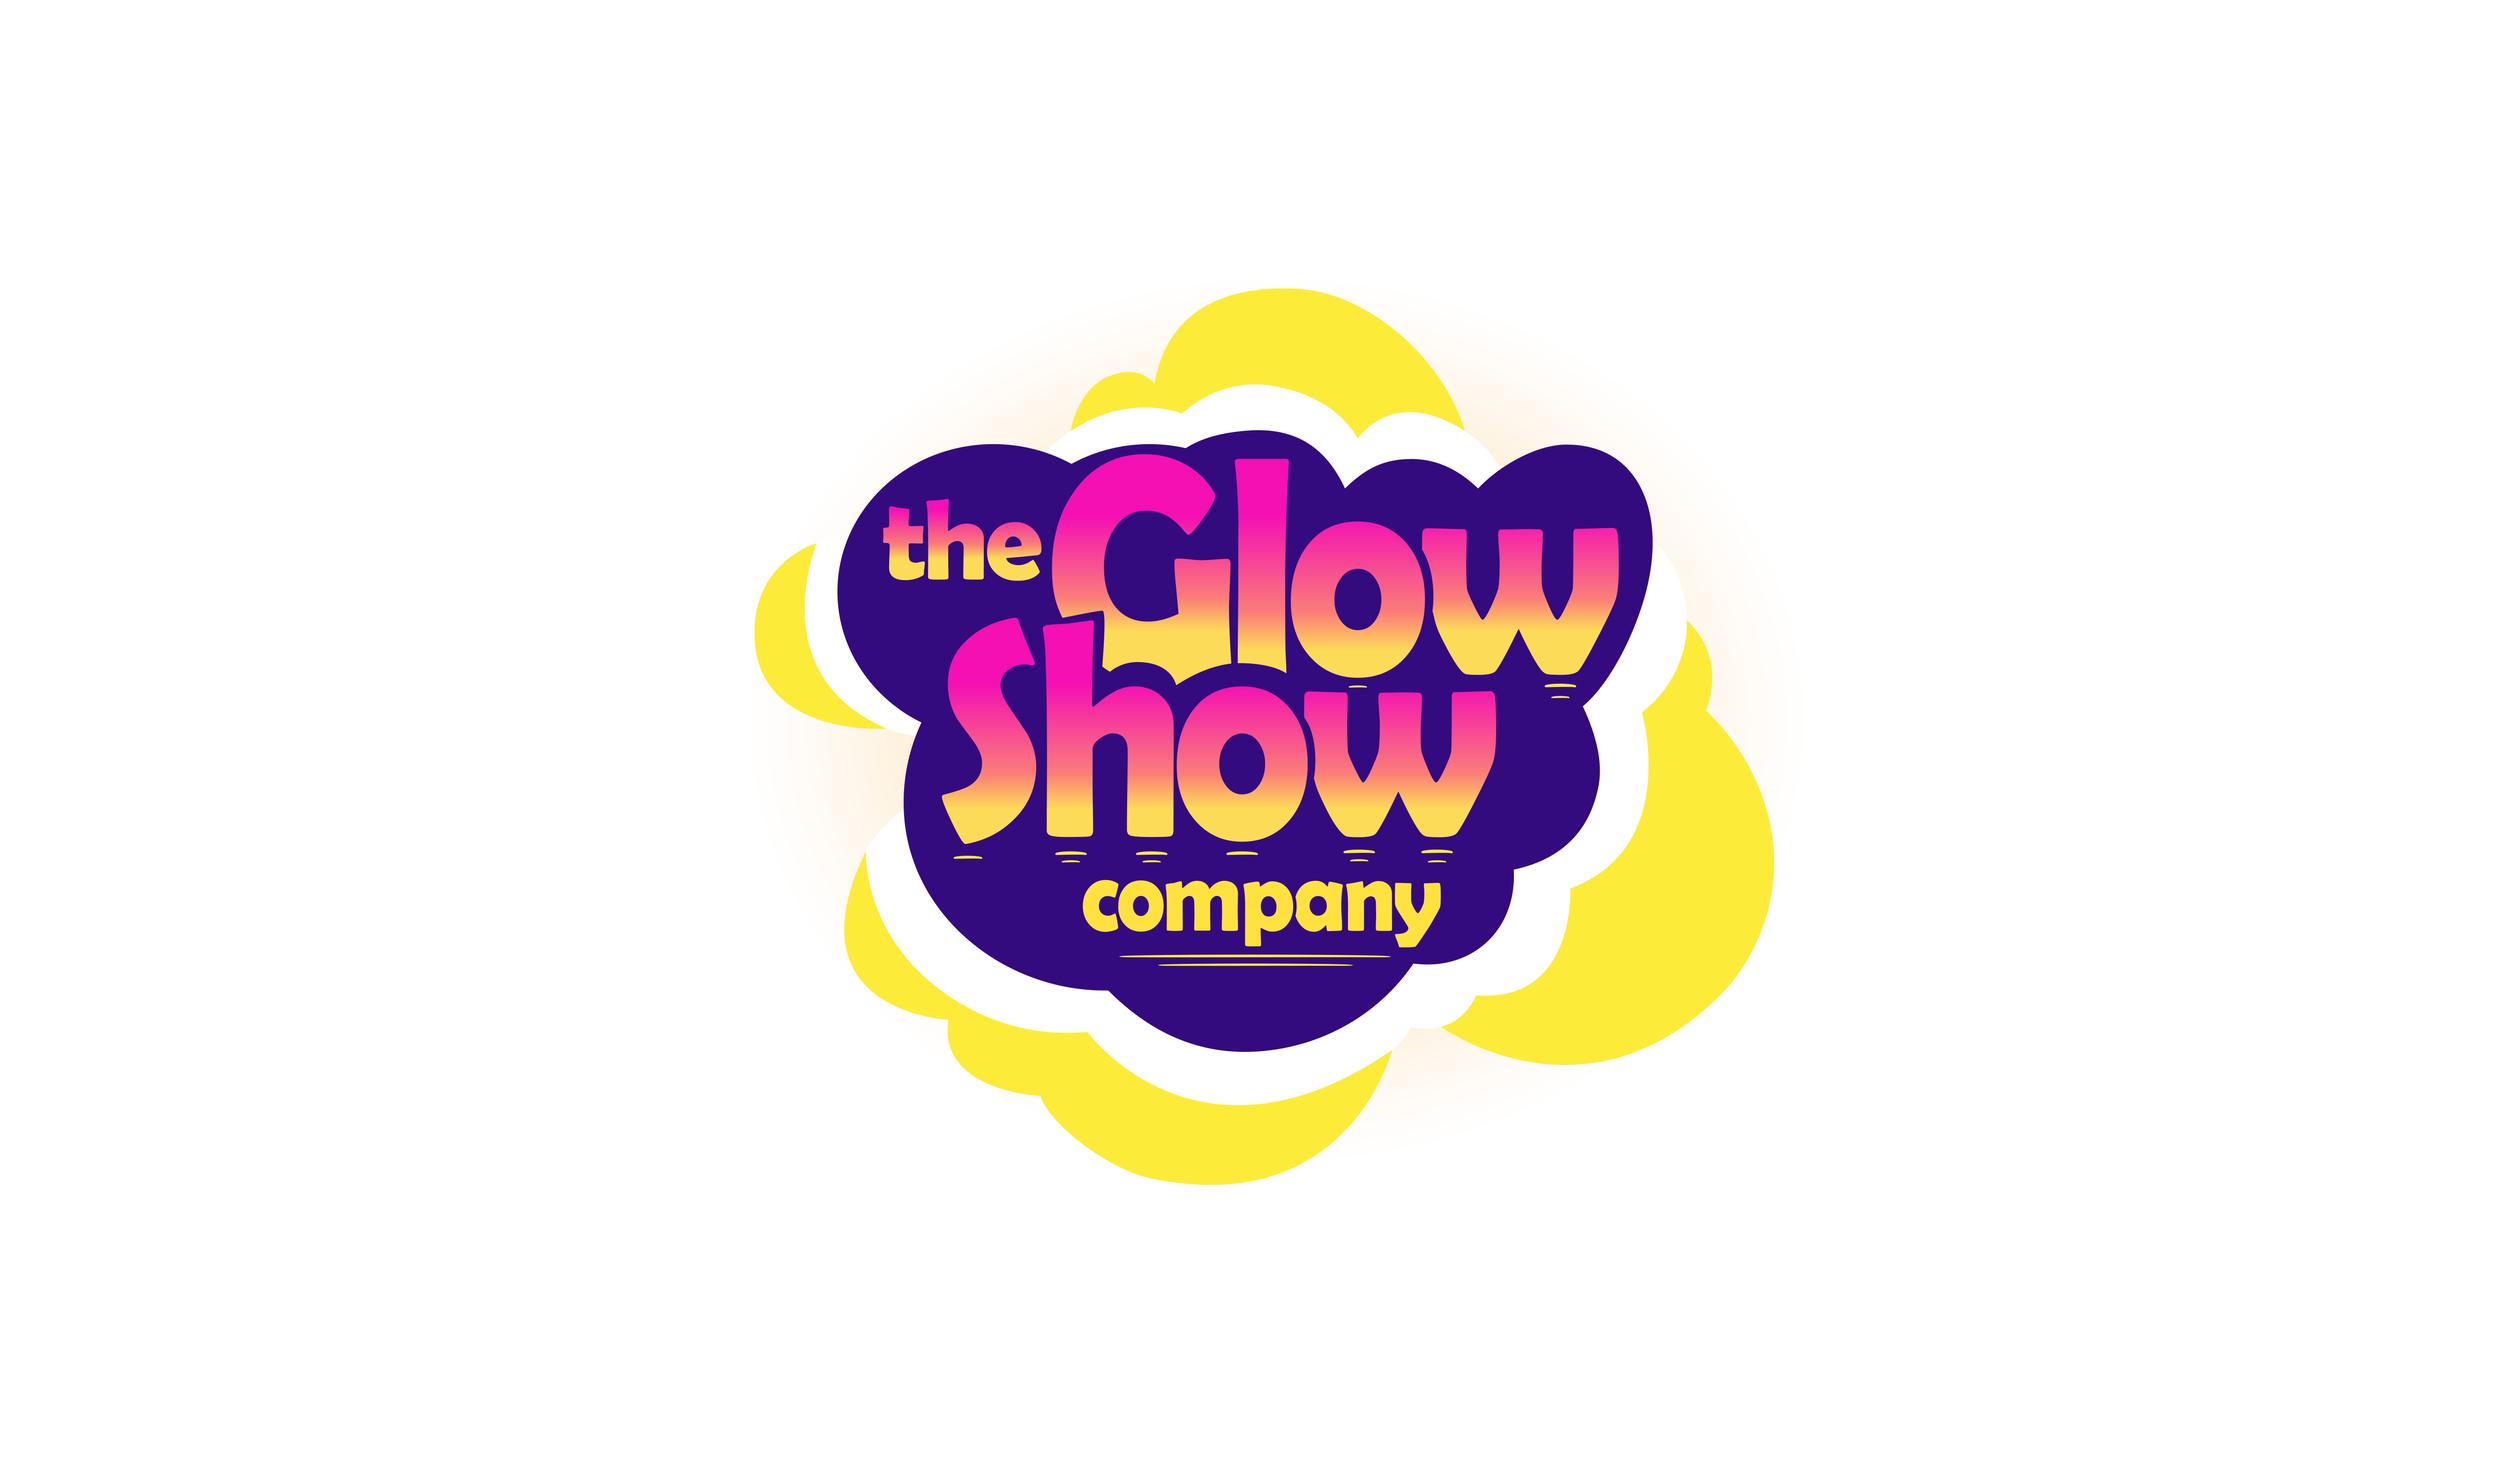 glow-show-company-logo.png